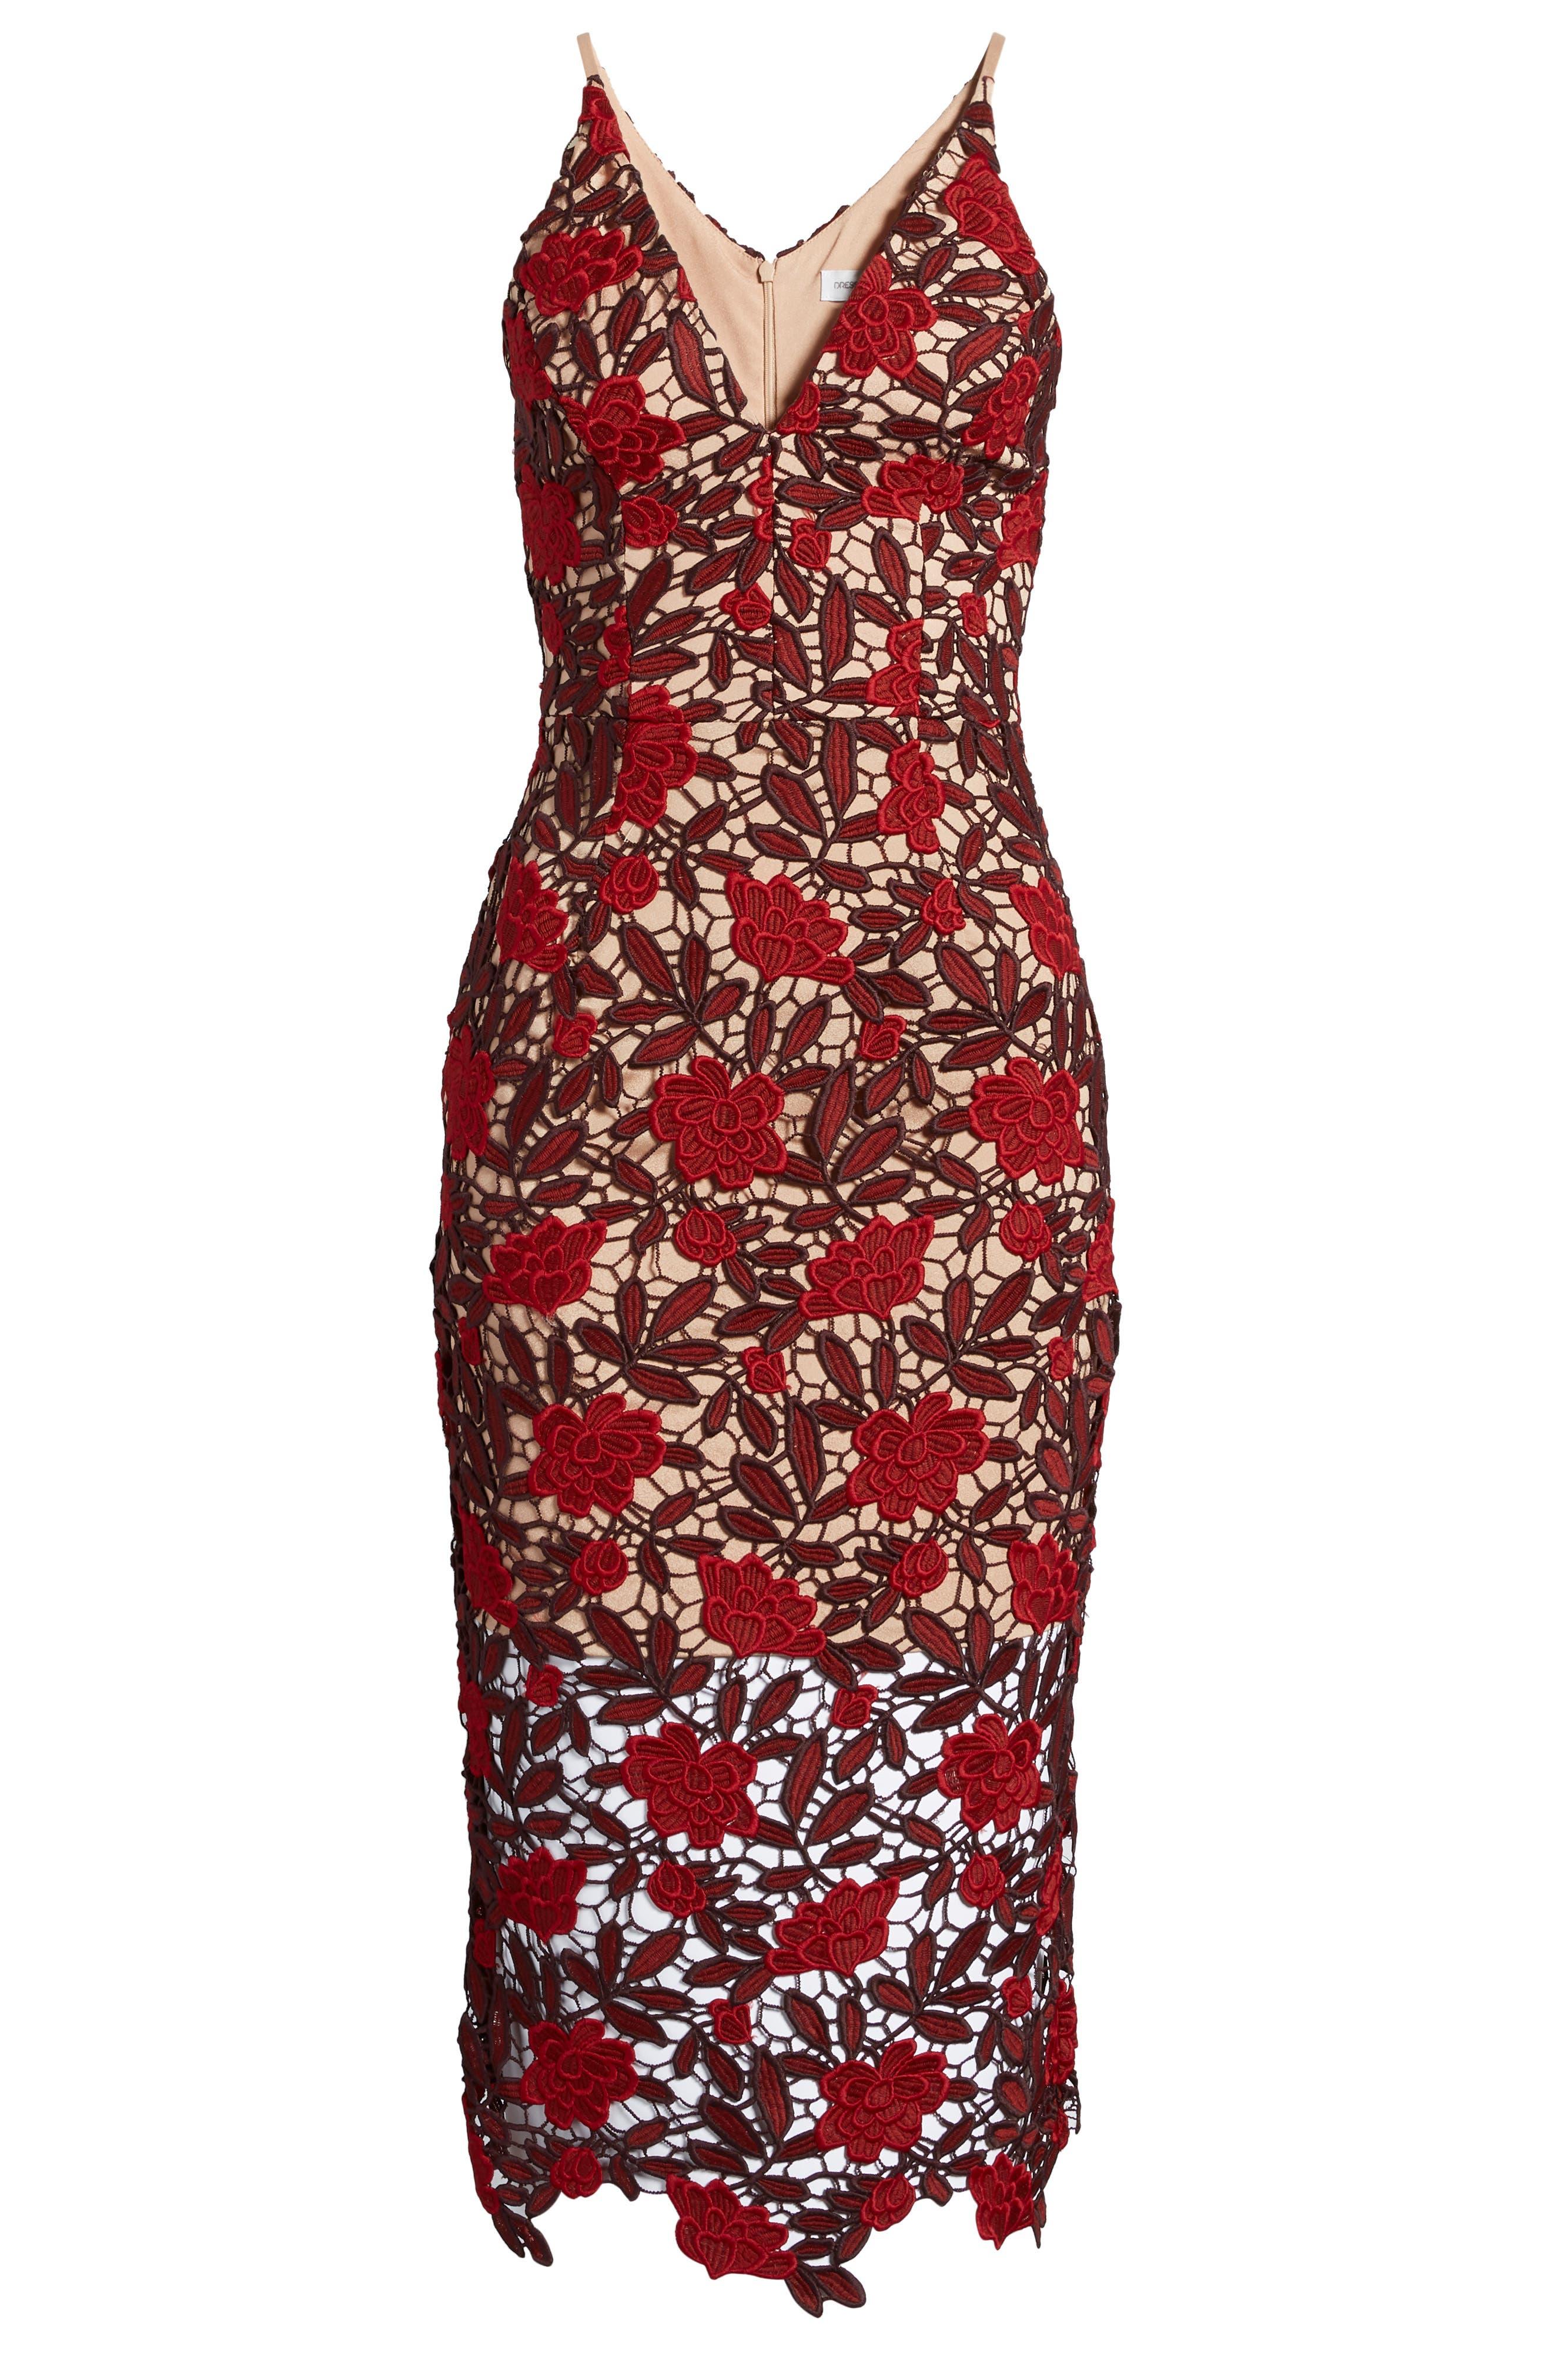 Aurora Embroidered Sheath Dress,                             Alternate thumbnail 8, color,                             GARNET/ NUDE